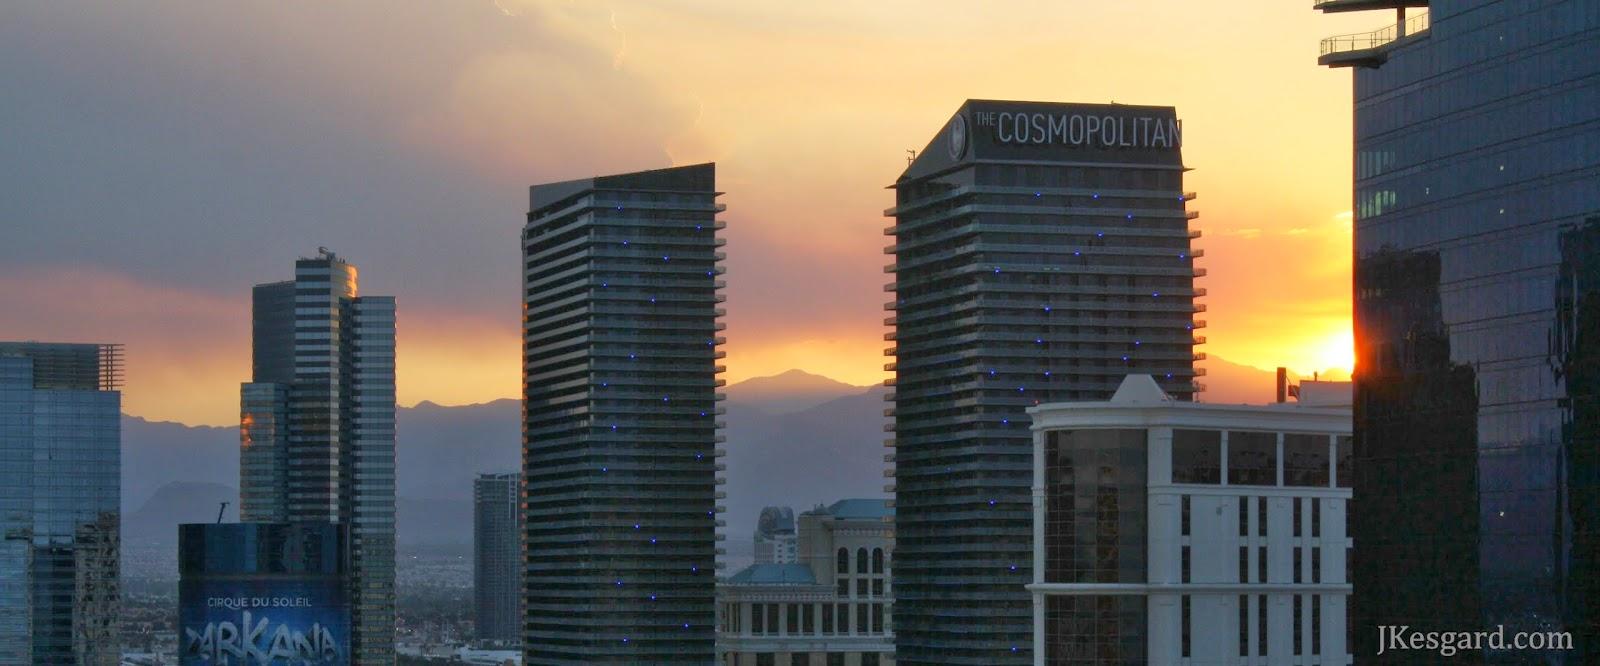 The Cosmopolitan and City Center